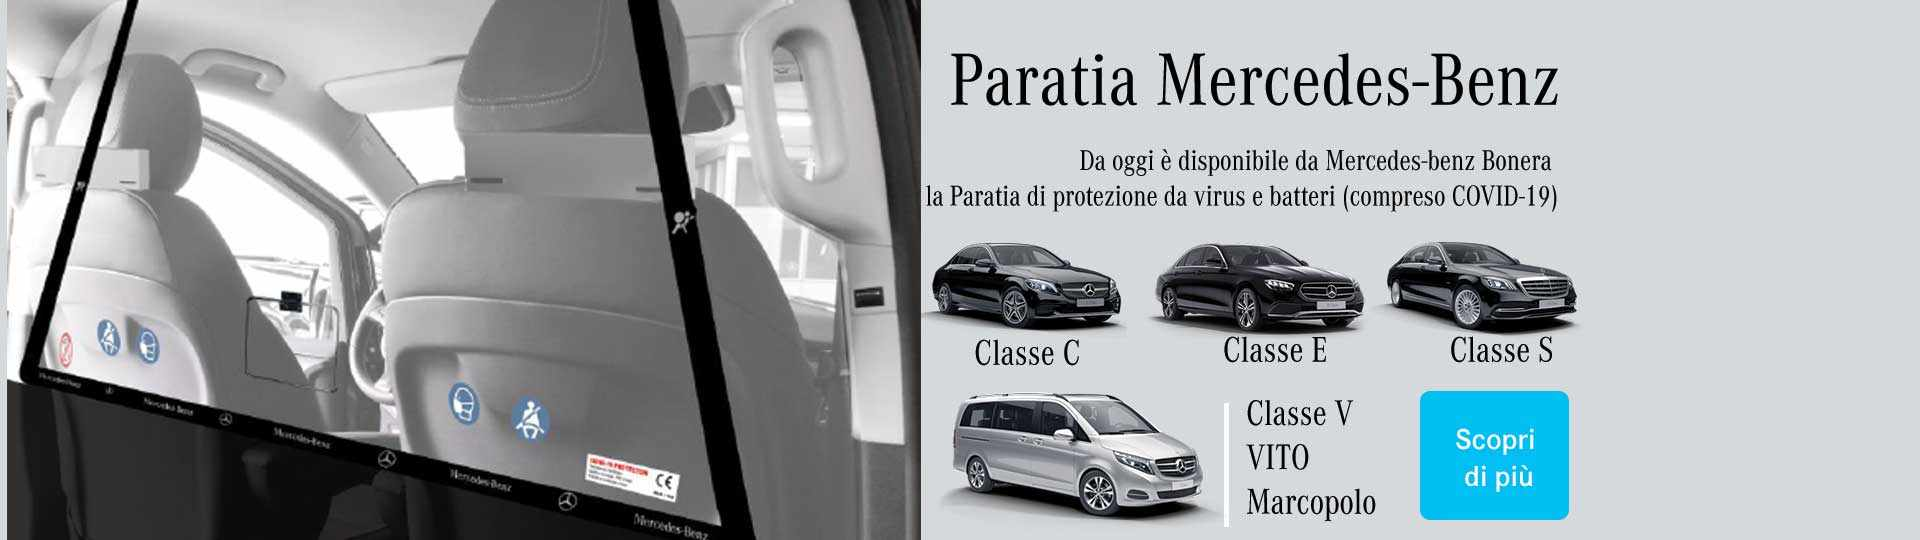 header_mercedes_paratia.jpg